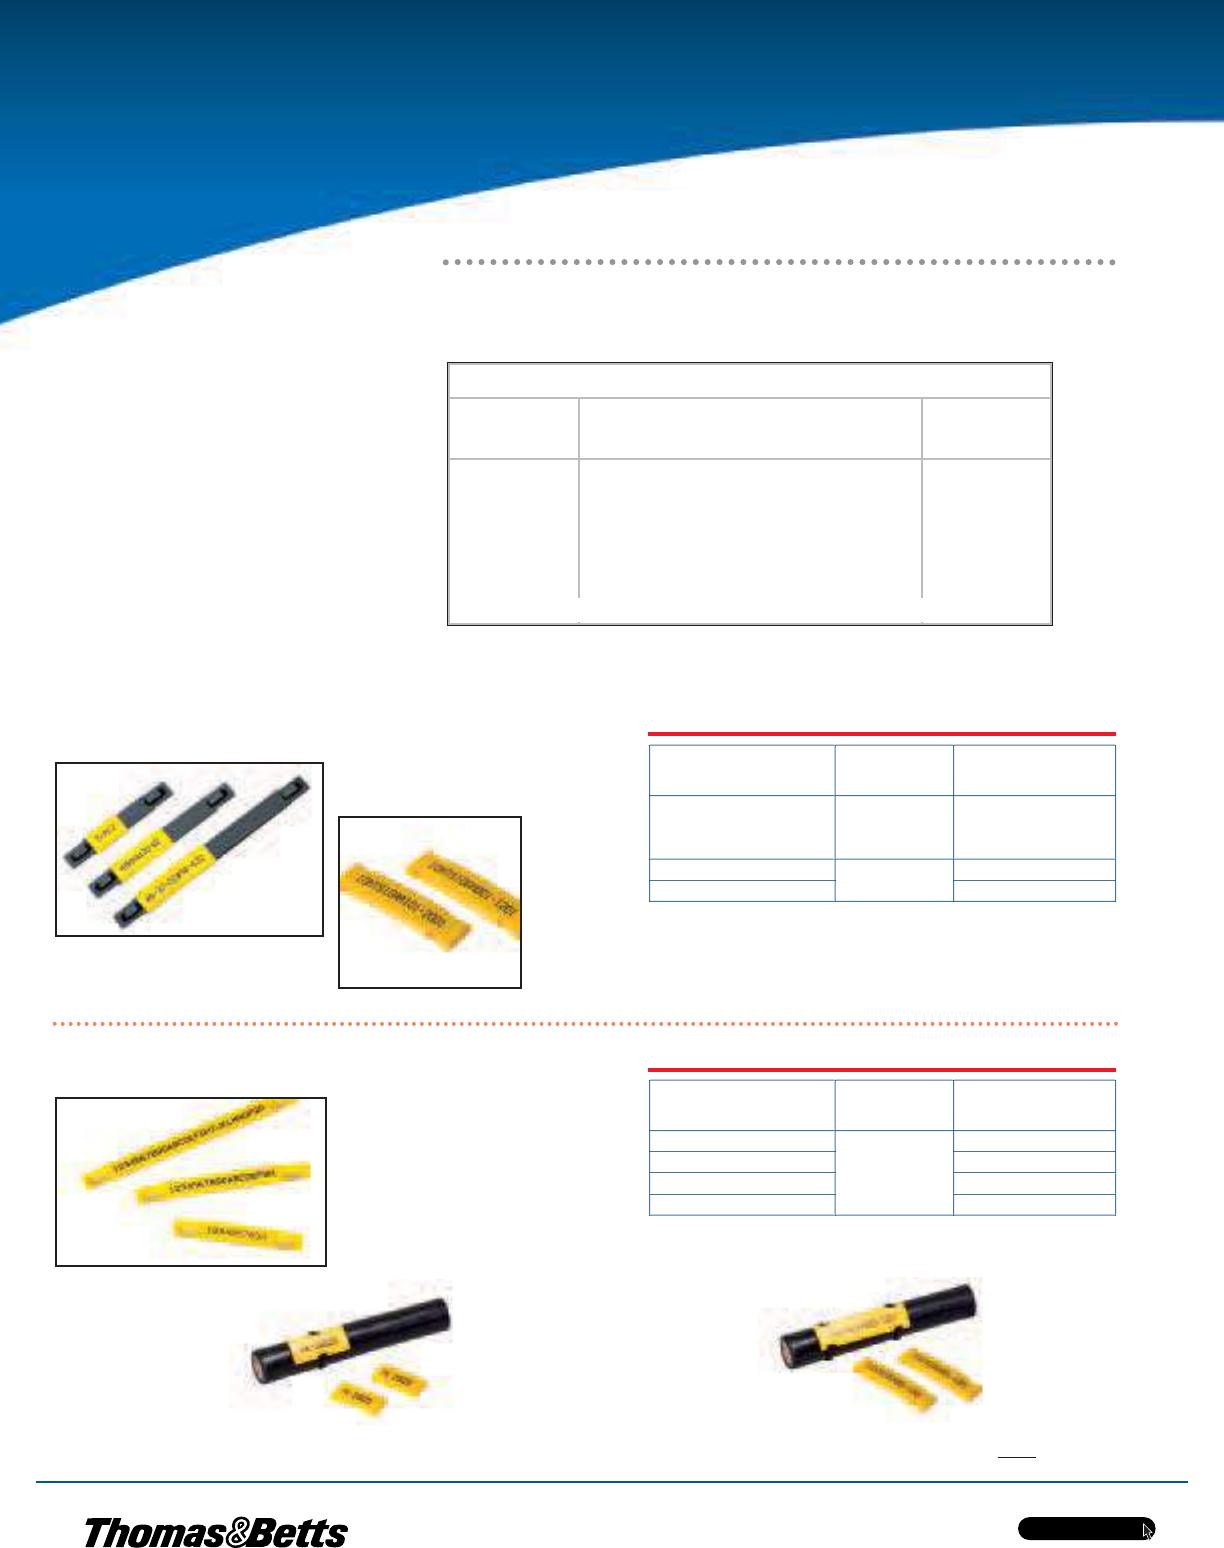 Thomas Betts E Z Code Identification Products 108217 Catalog Tnb 3 Phase Meter Fuse Box Tnbca